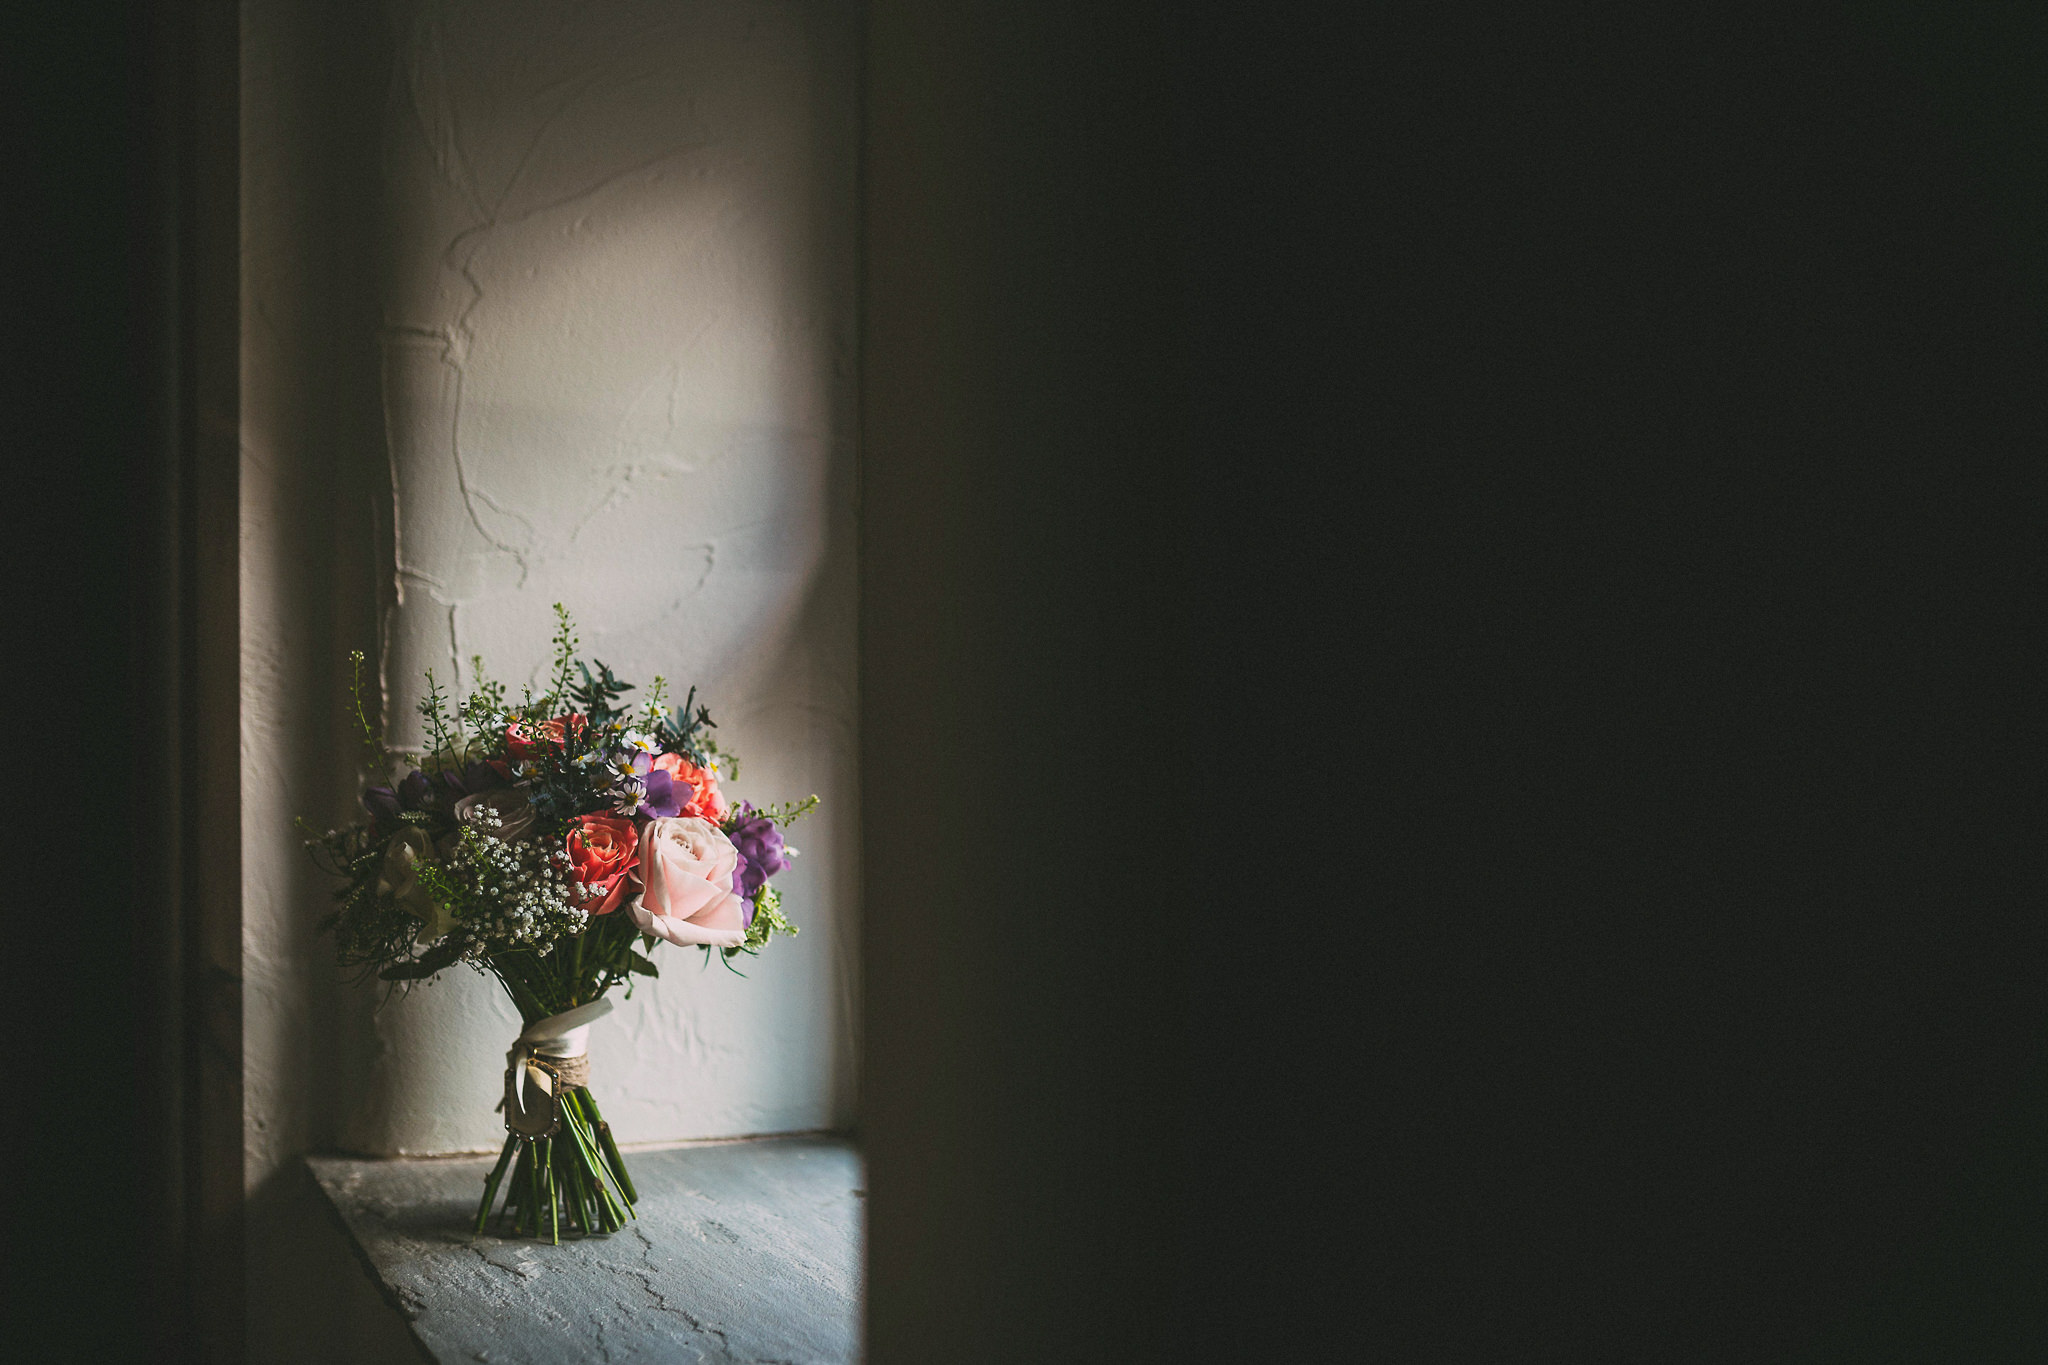 Lancashire-Creative-natural-documentary-wedding-photography-90013